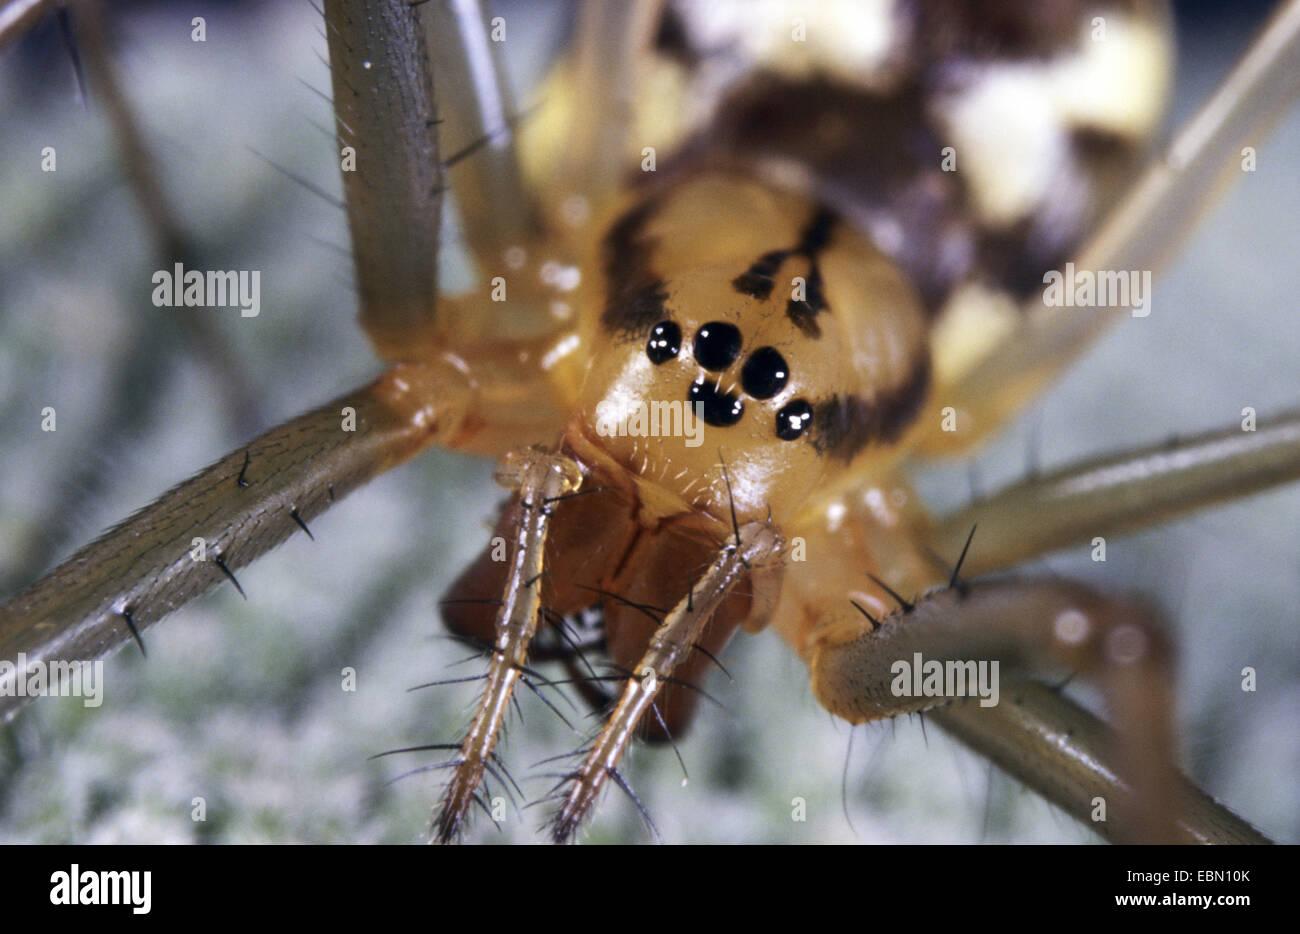 Sheet-web weaver, Line-weaving spider, Line weaver (Linyphia triangularis), female, Germany - Stock Image